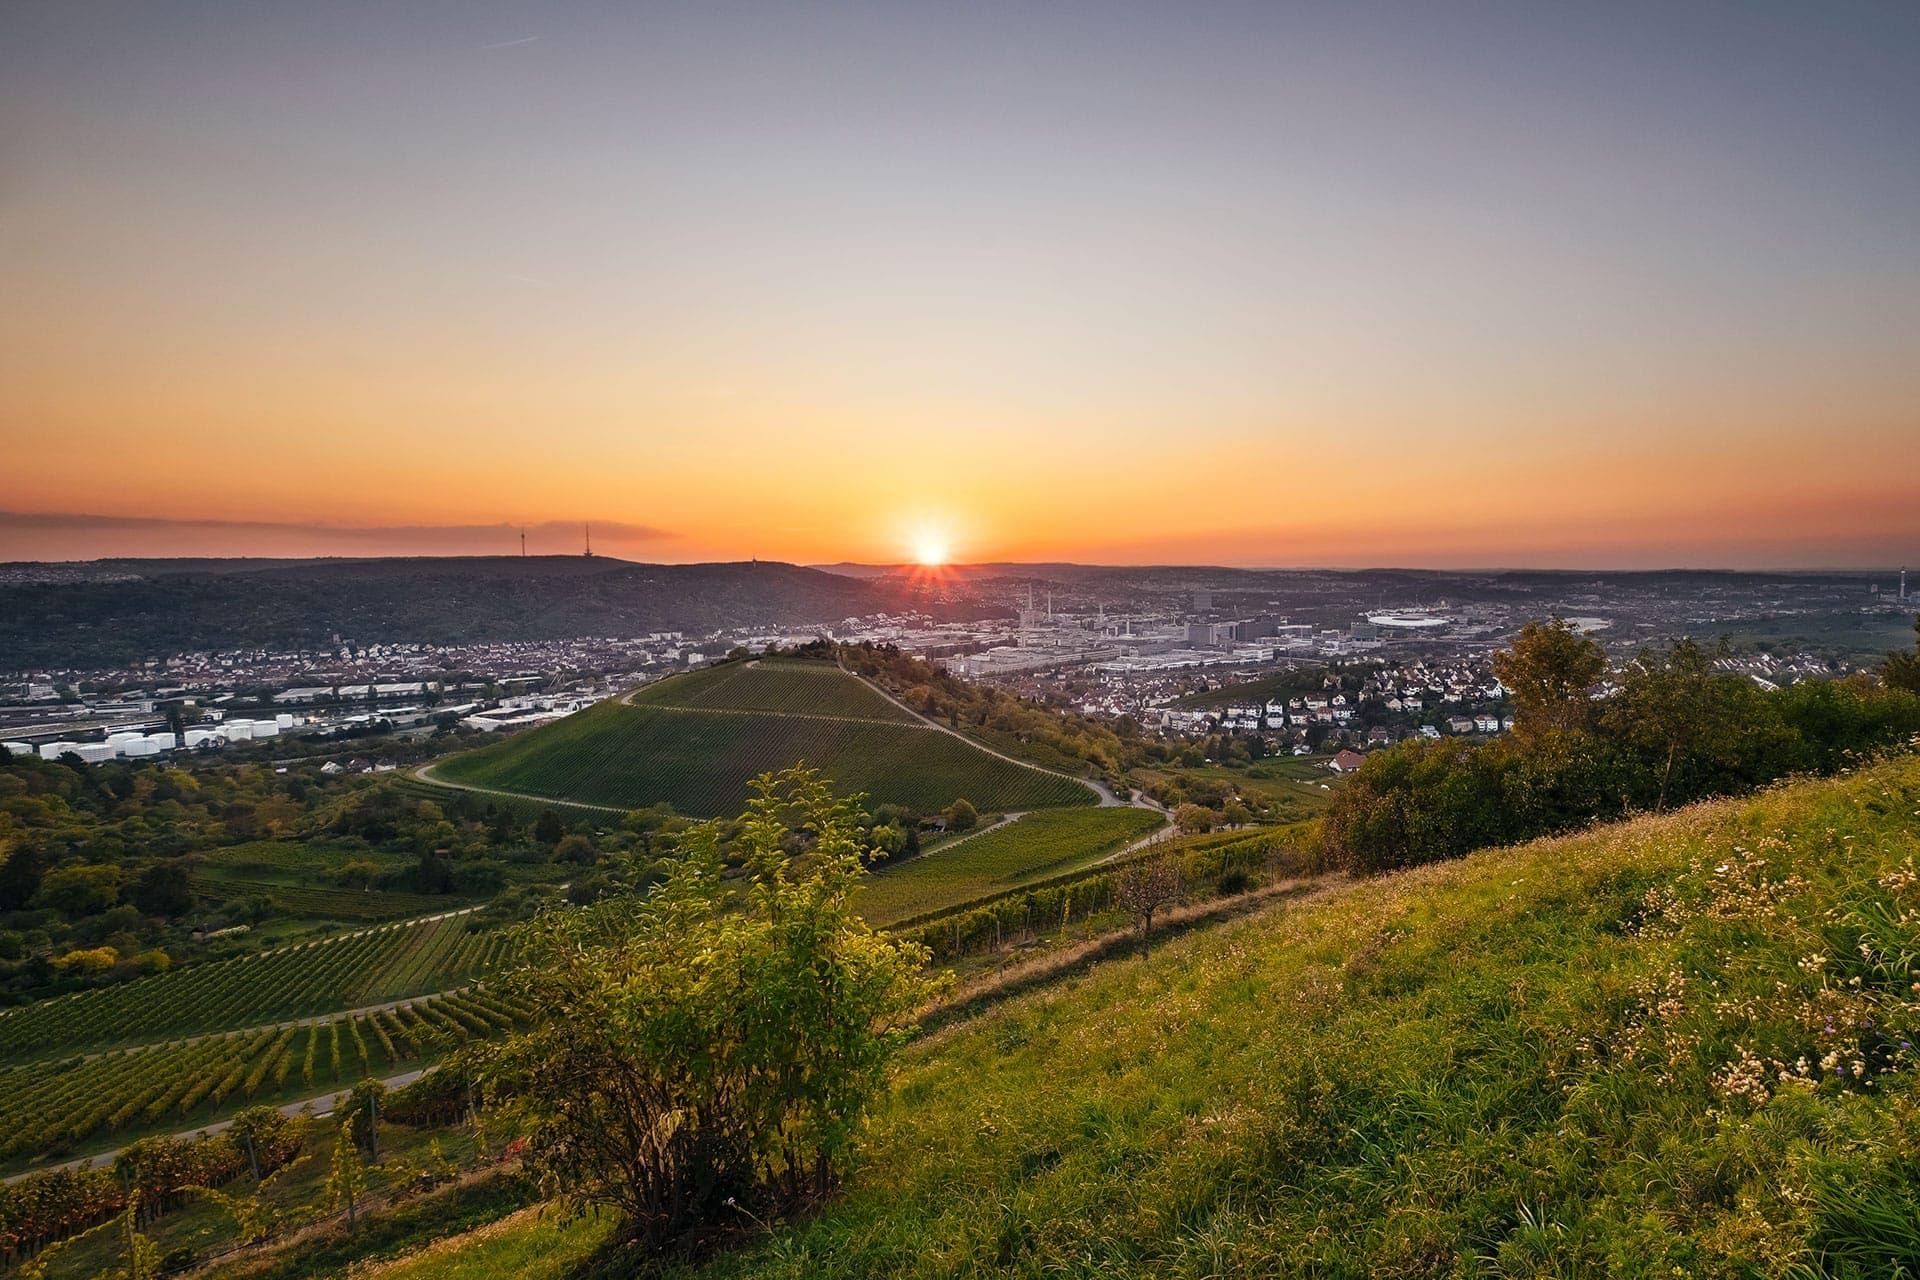 Landschaftsfotos aus Stuttgart